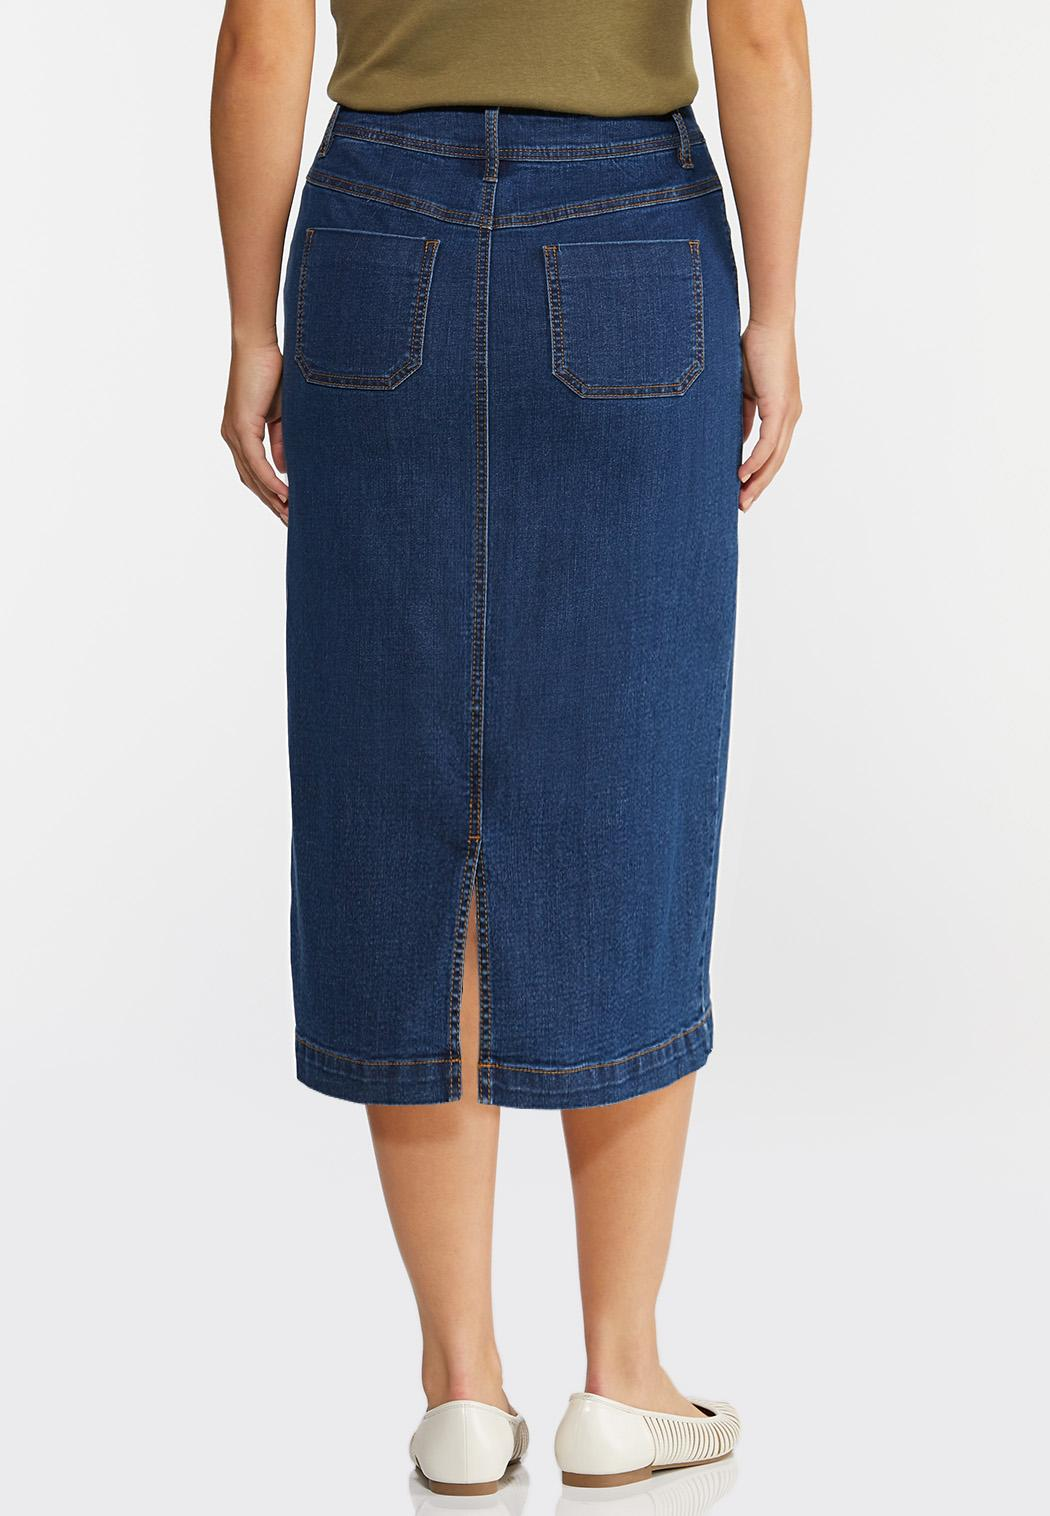 Plus Size Button Pocket Denim Skirt (Item #44334637)